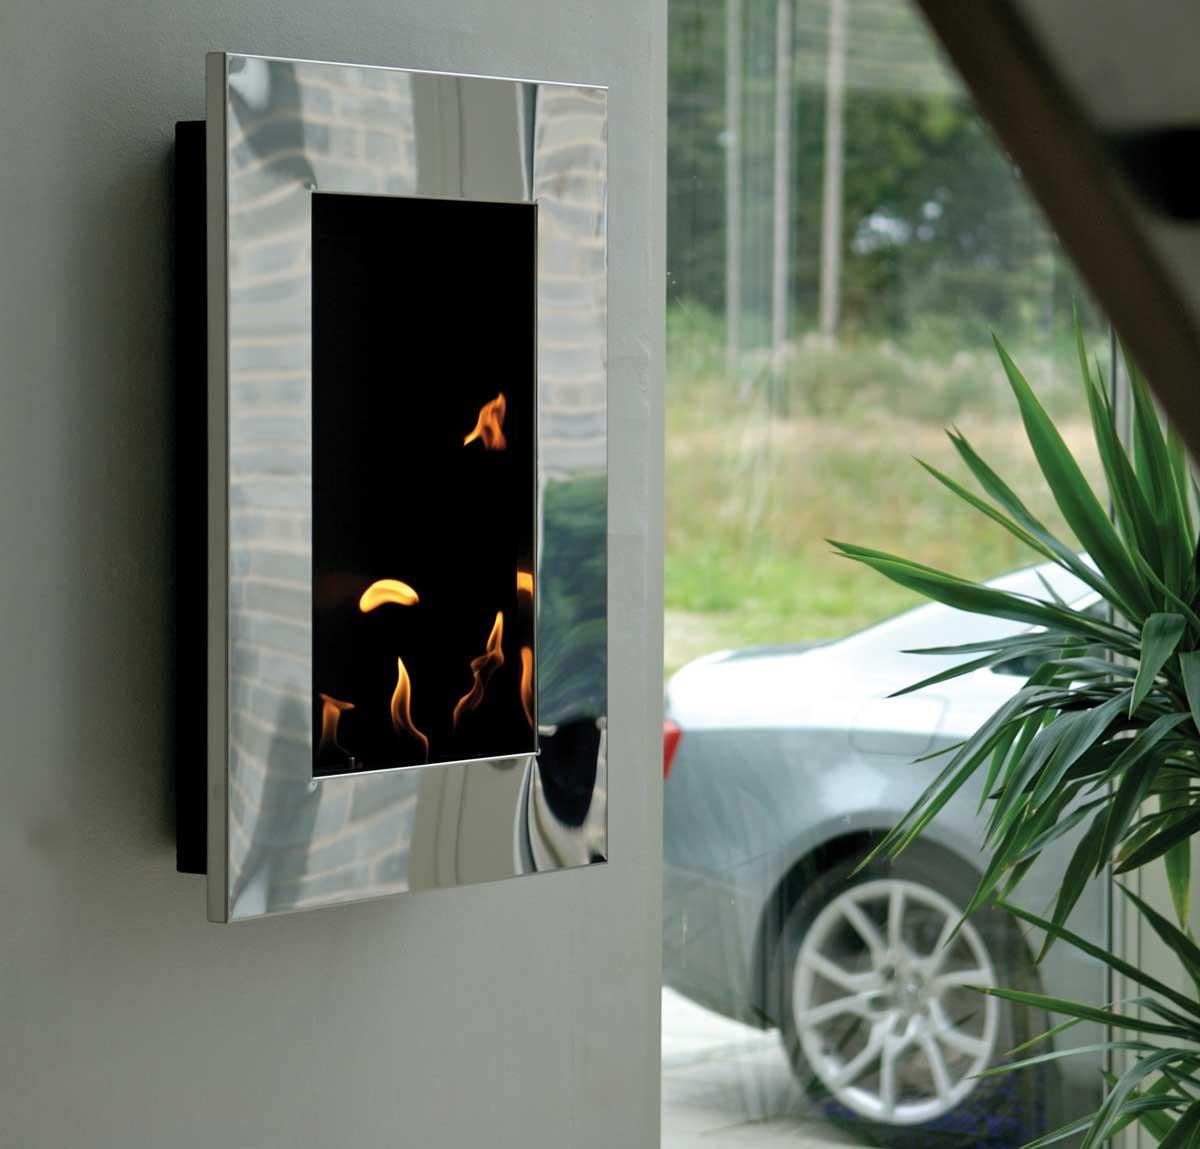 bioethanol wandkamin new york tower von decoflame. Black Bedroom Furniture Sets. Home Design Ideas